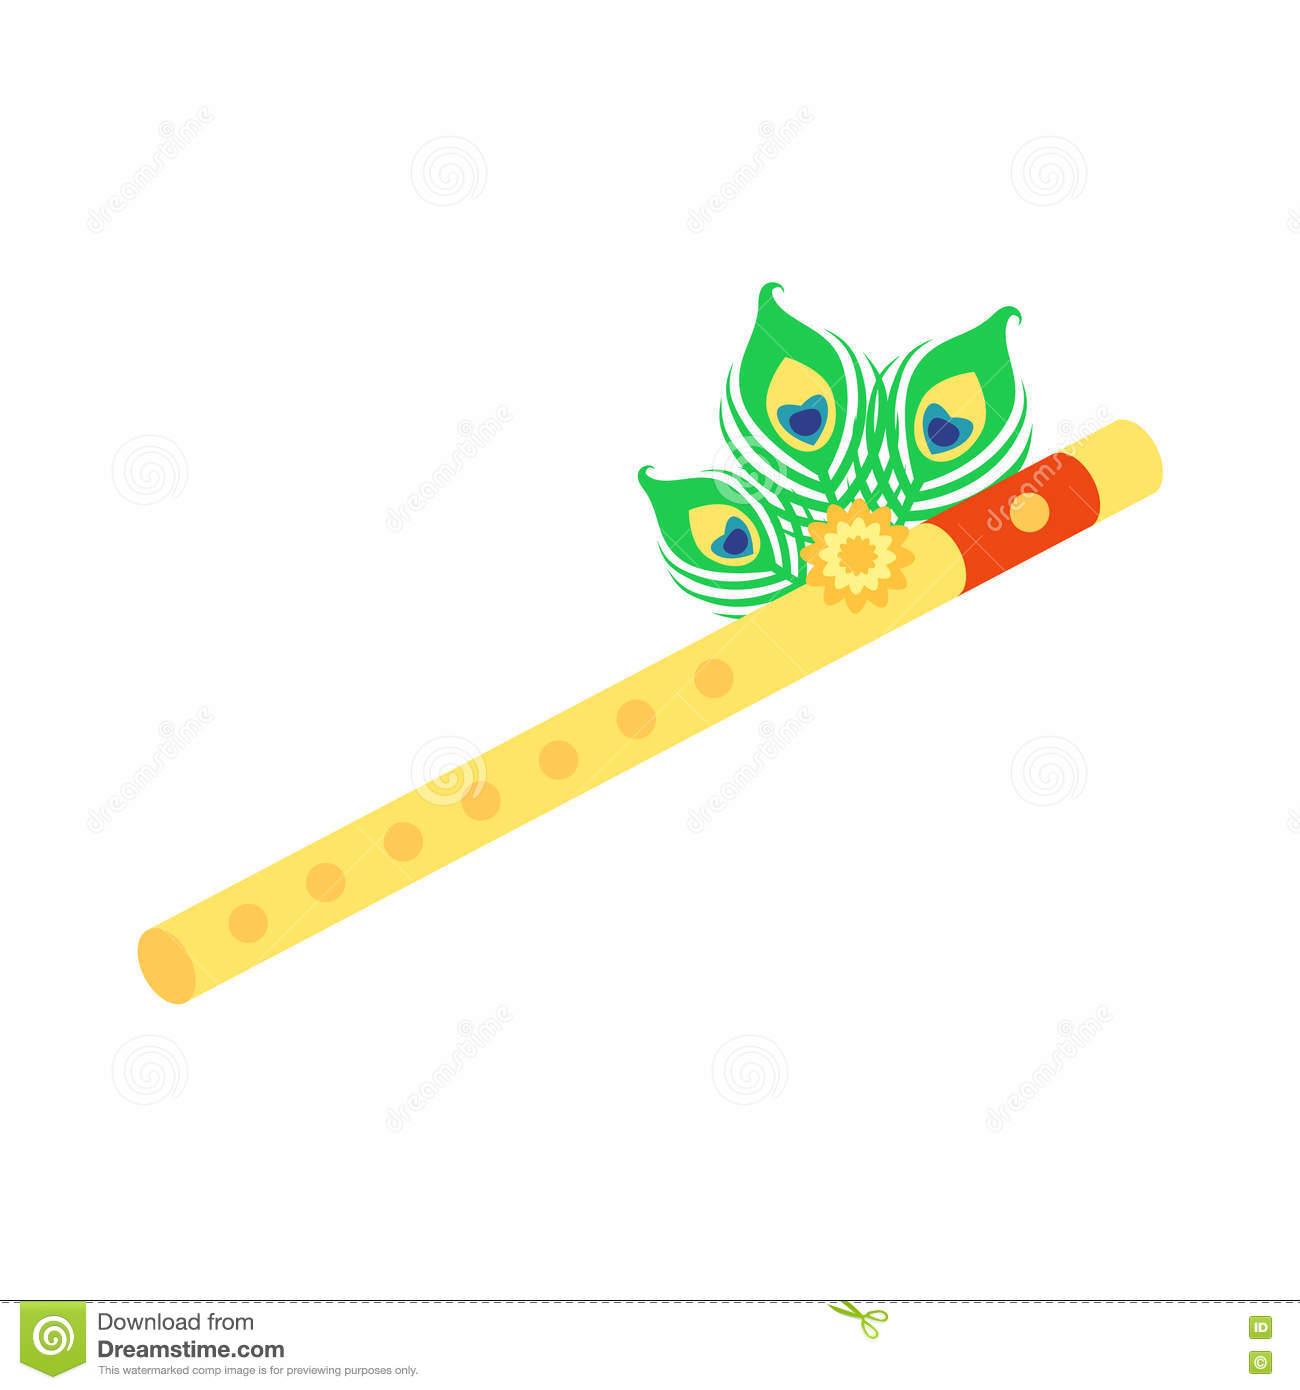 Flutes clipart krishna. Flute station